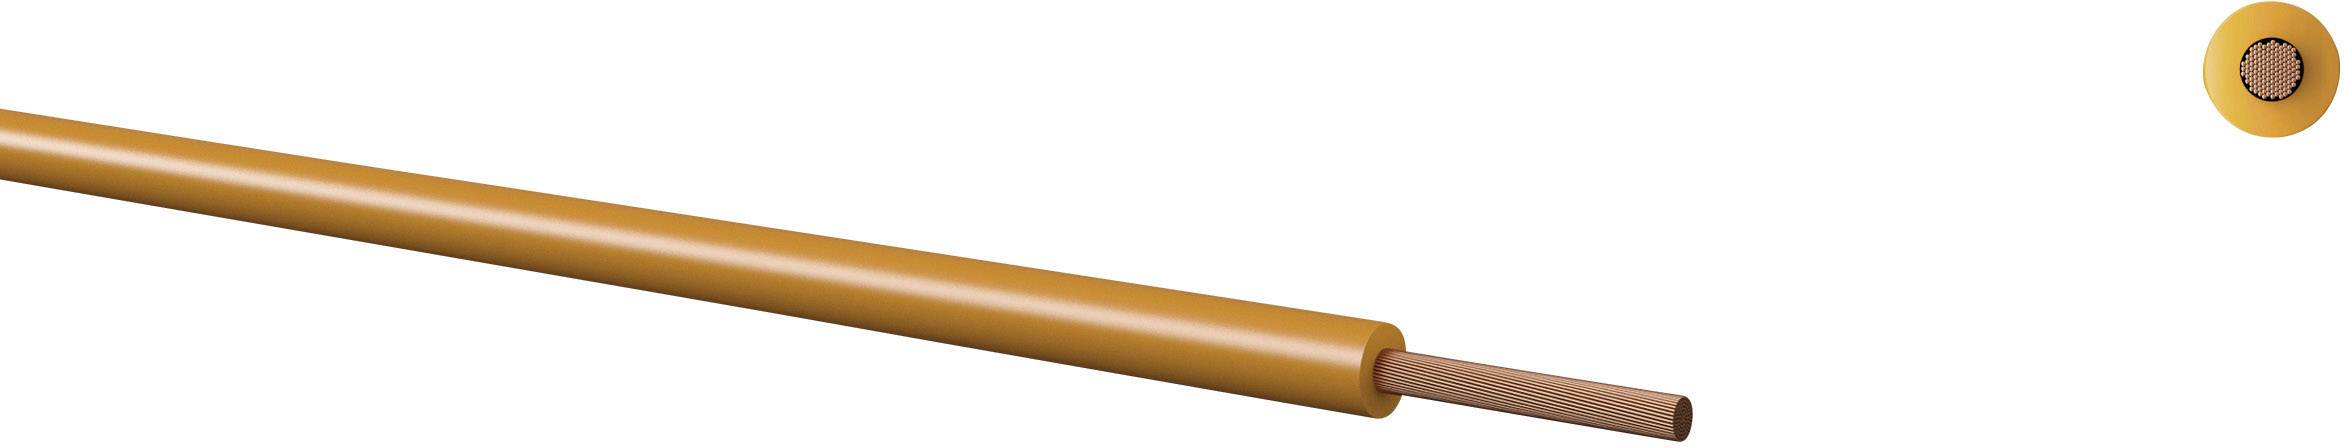 Pletenica LiFY 1 x 0.75 mm, rdeča Kabeltronik 160107508 cena za meter